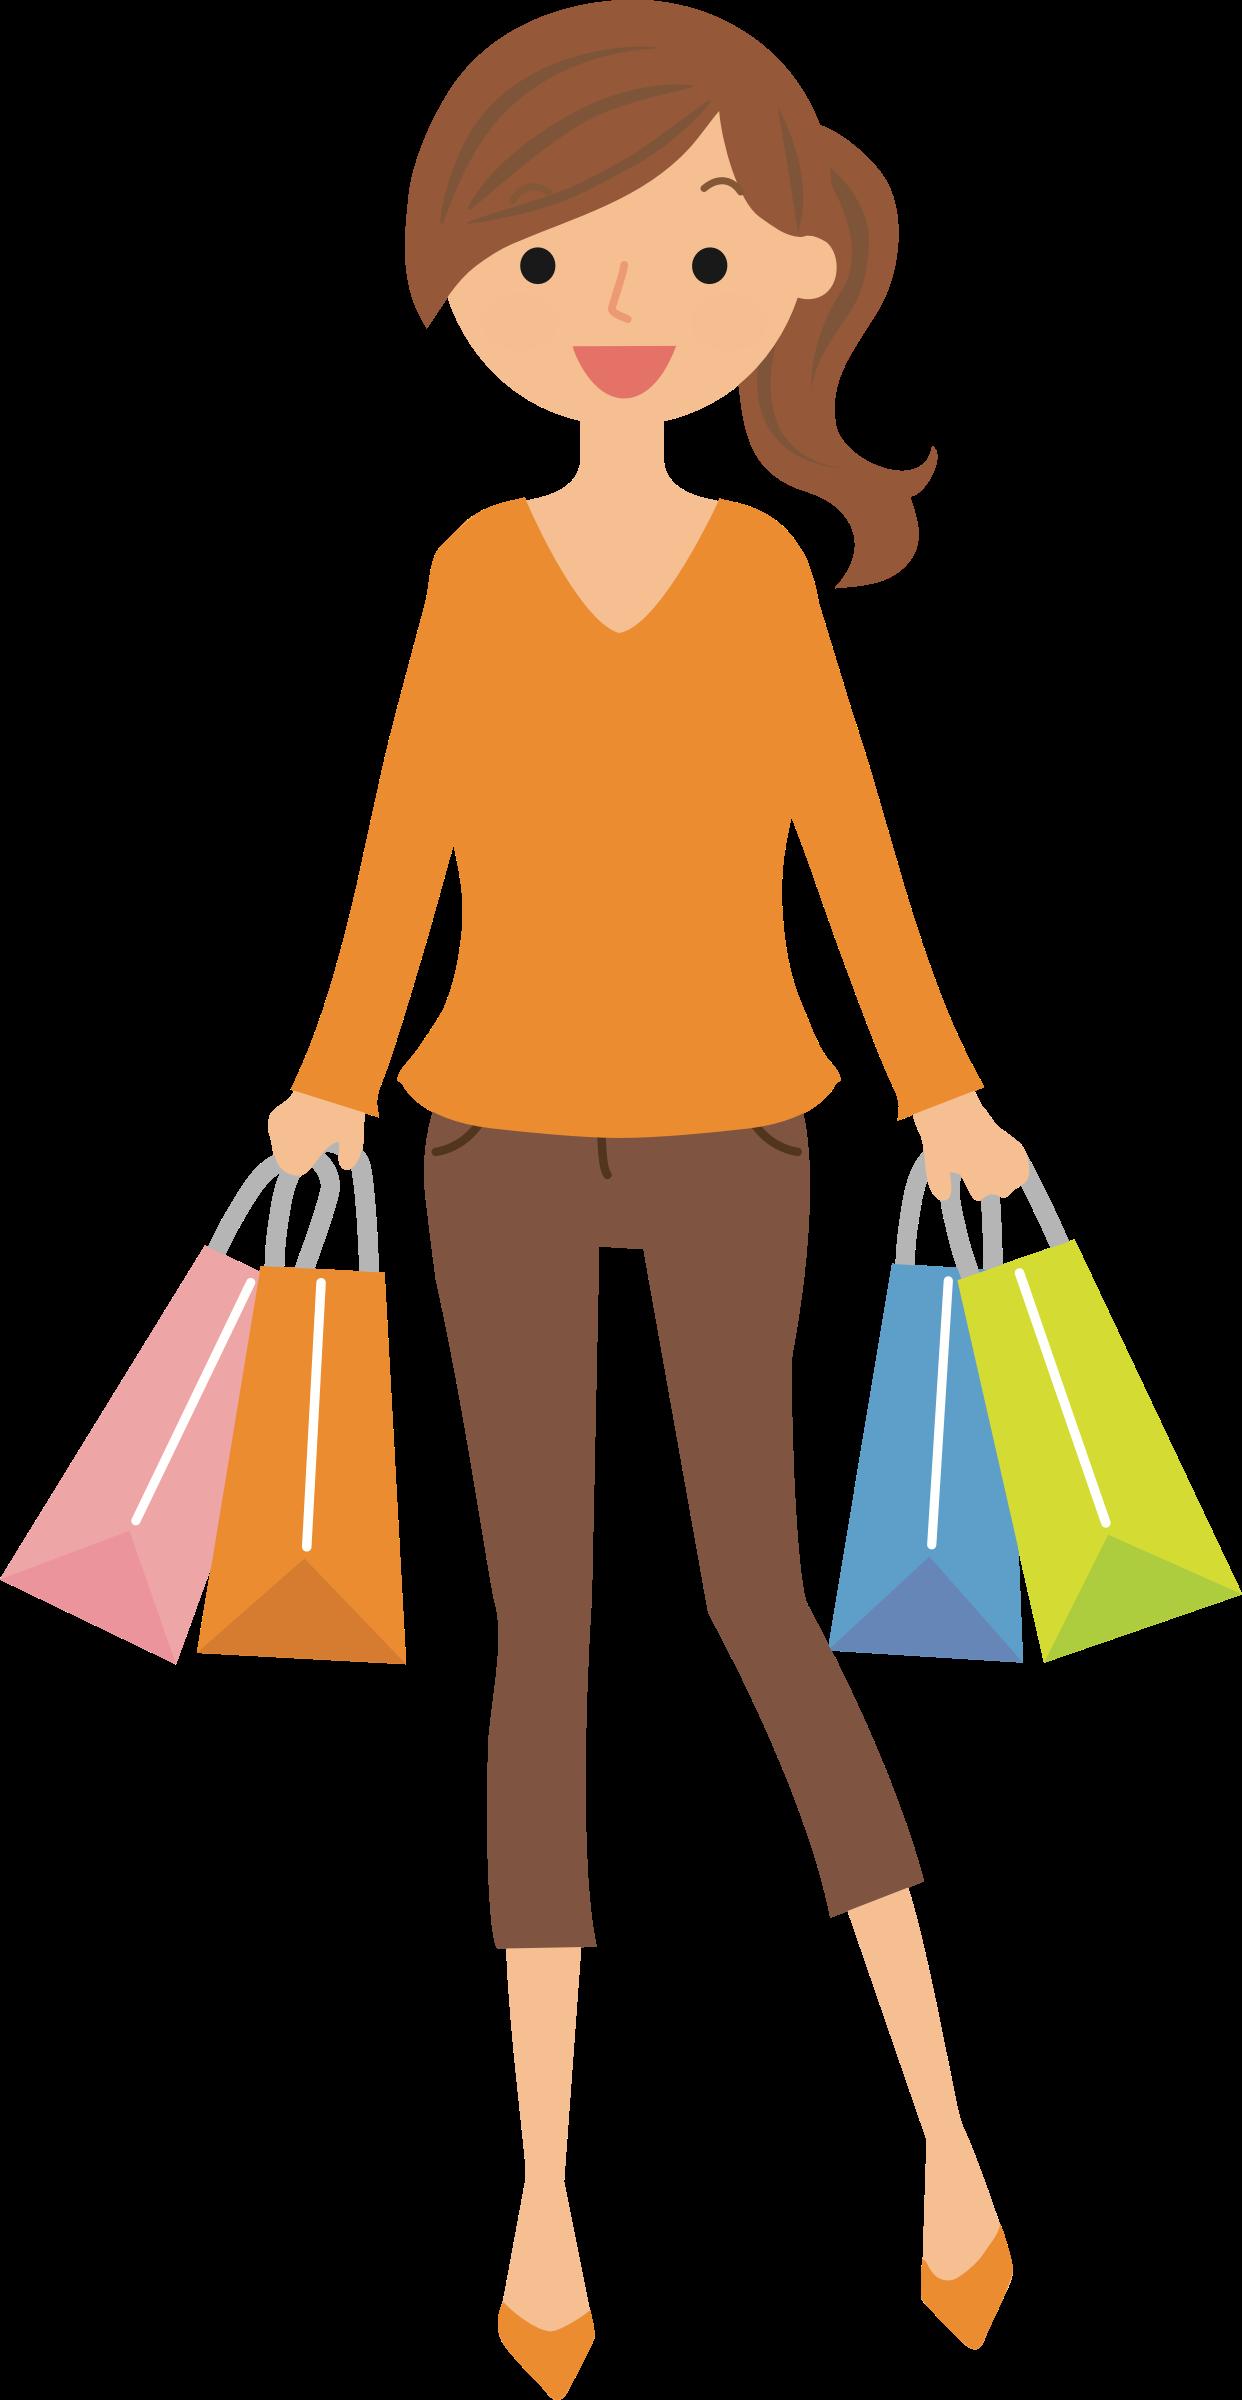 Female clipart customer, Female customer Transparent FREE.